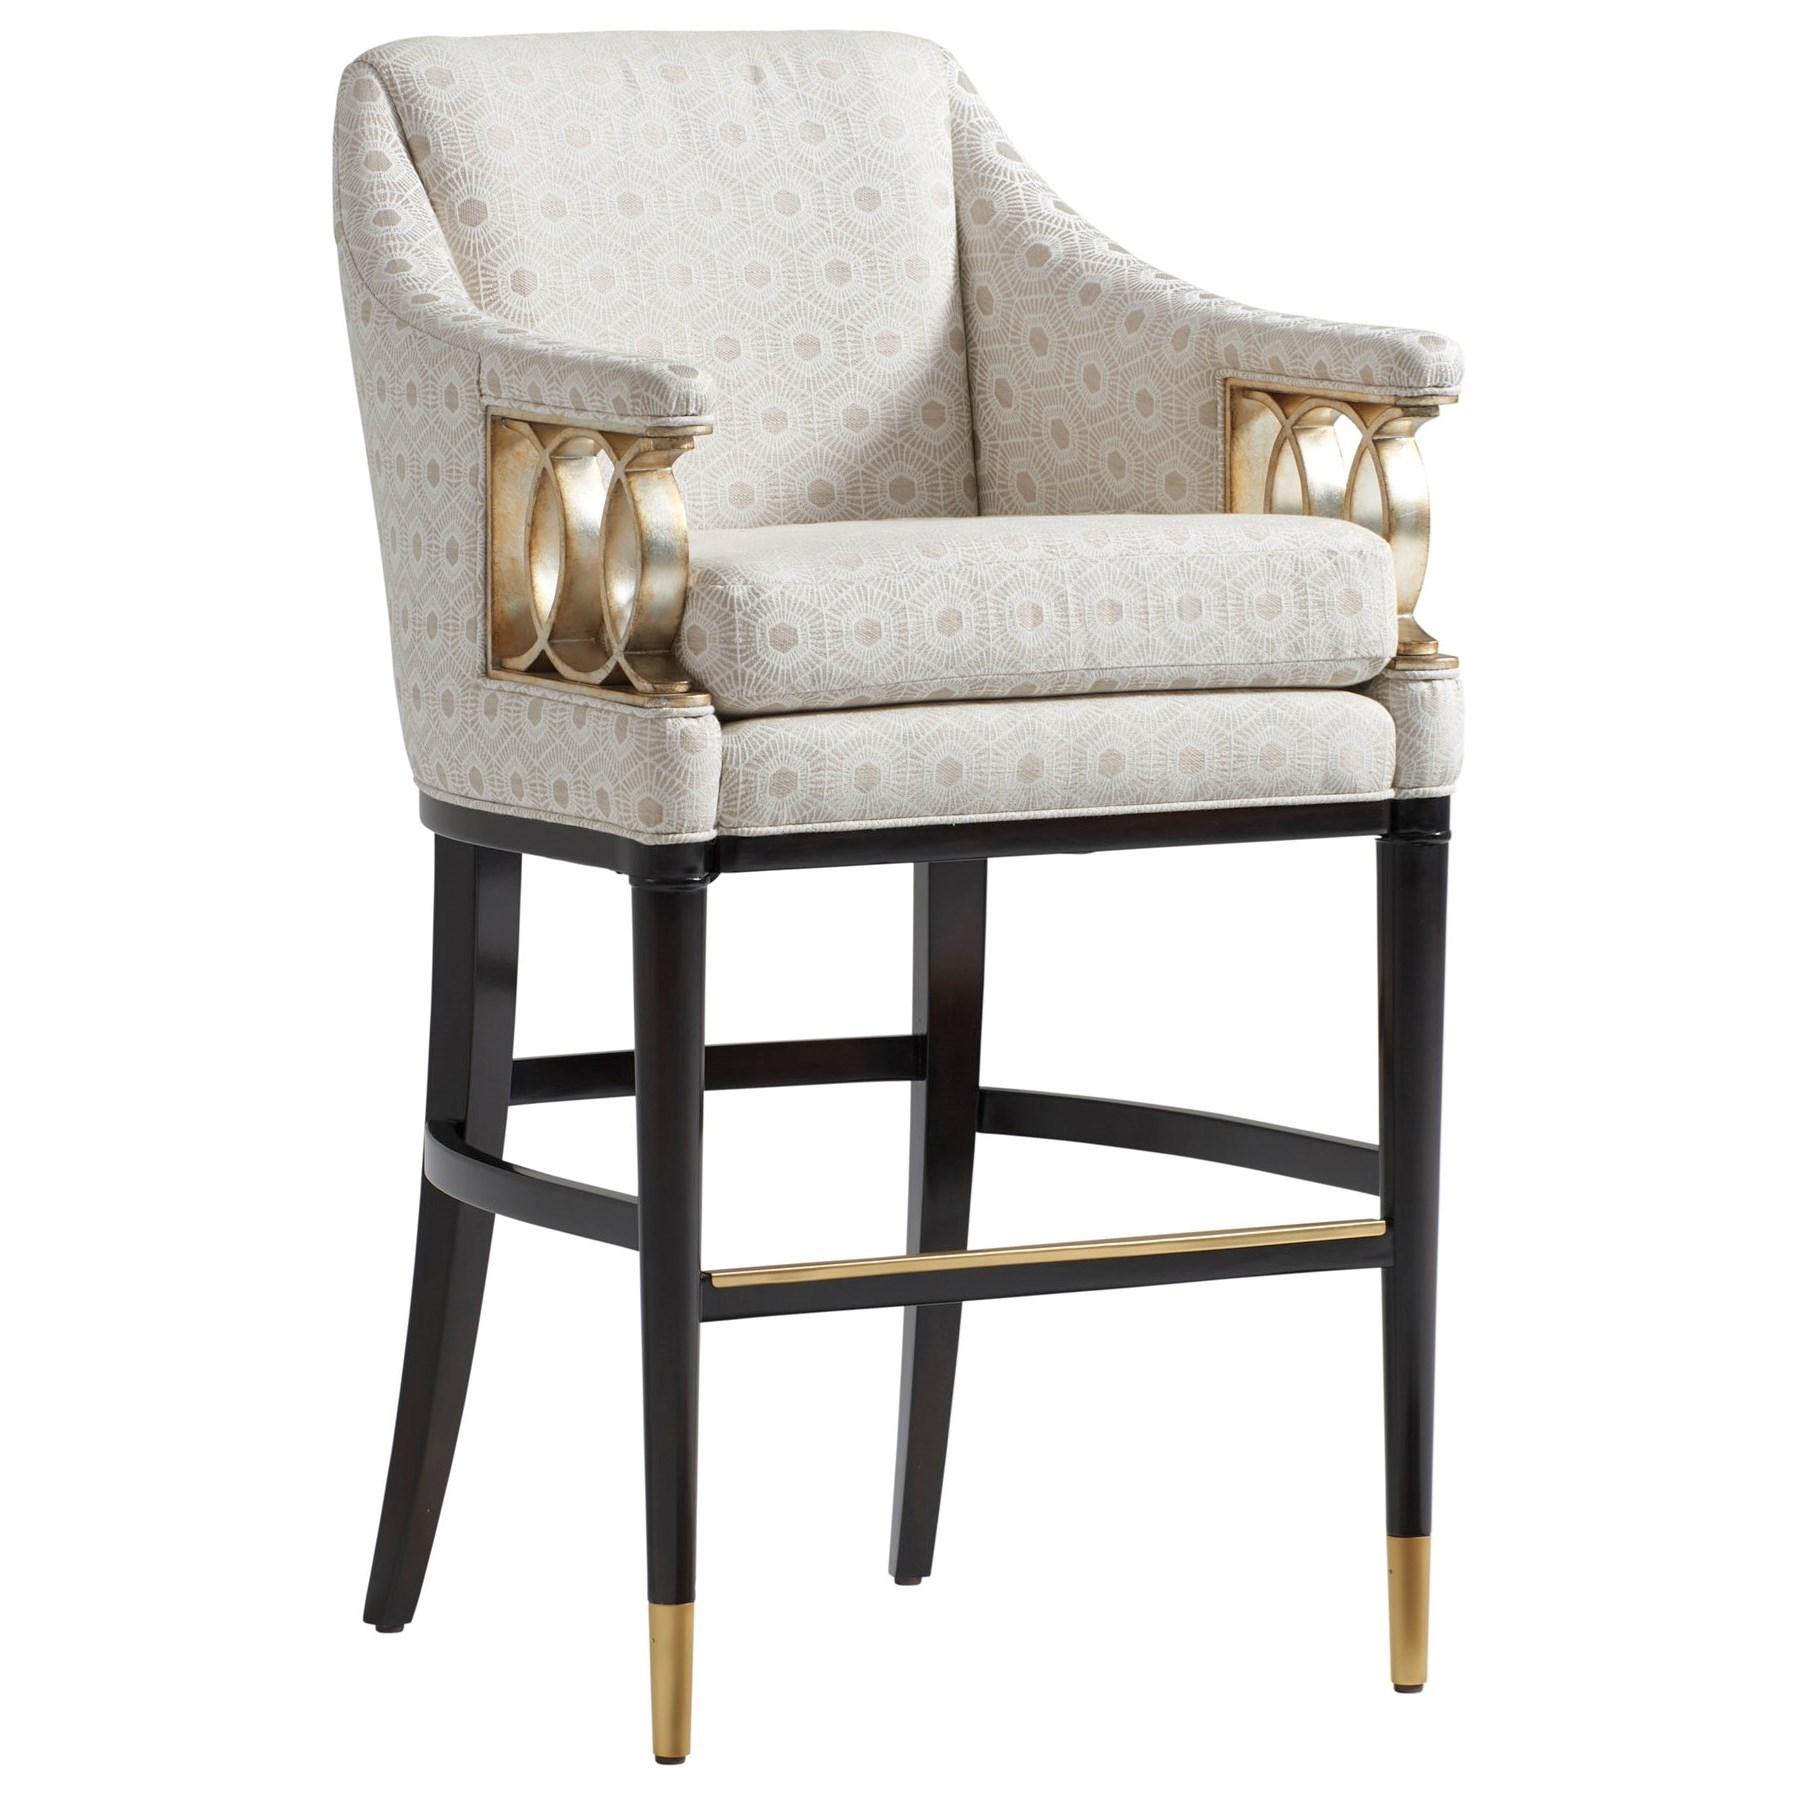 Carlyle Hemsley Upholstered Bar Stool - Custom by Lexington at Baer's Furniture